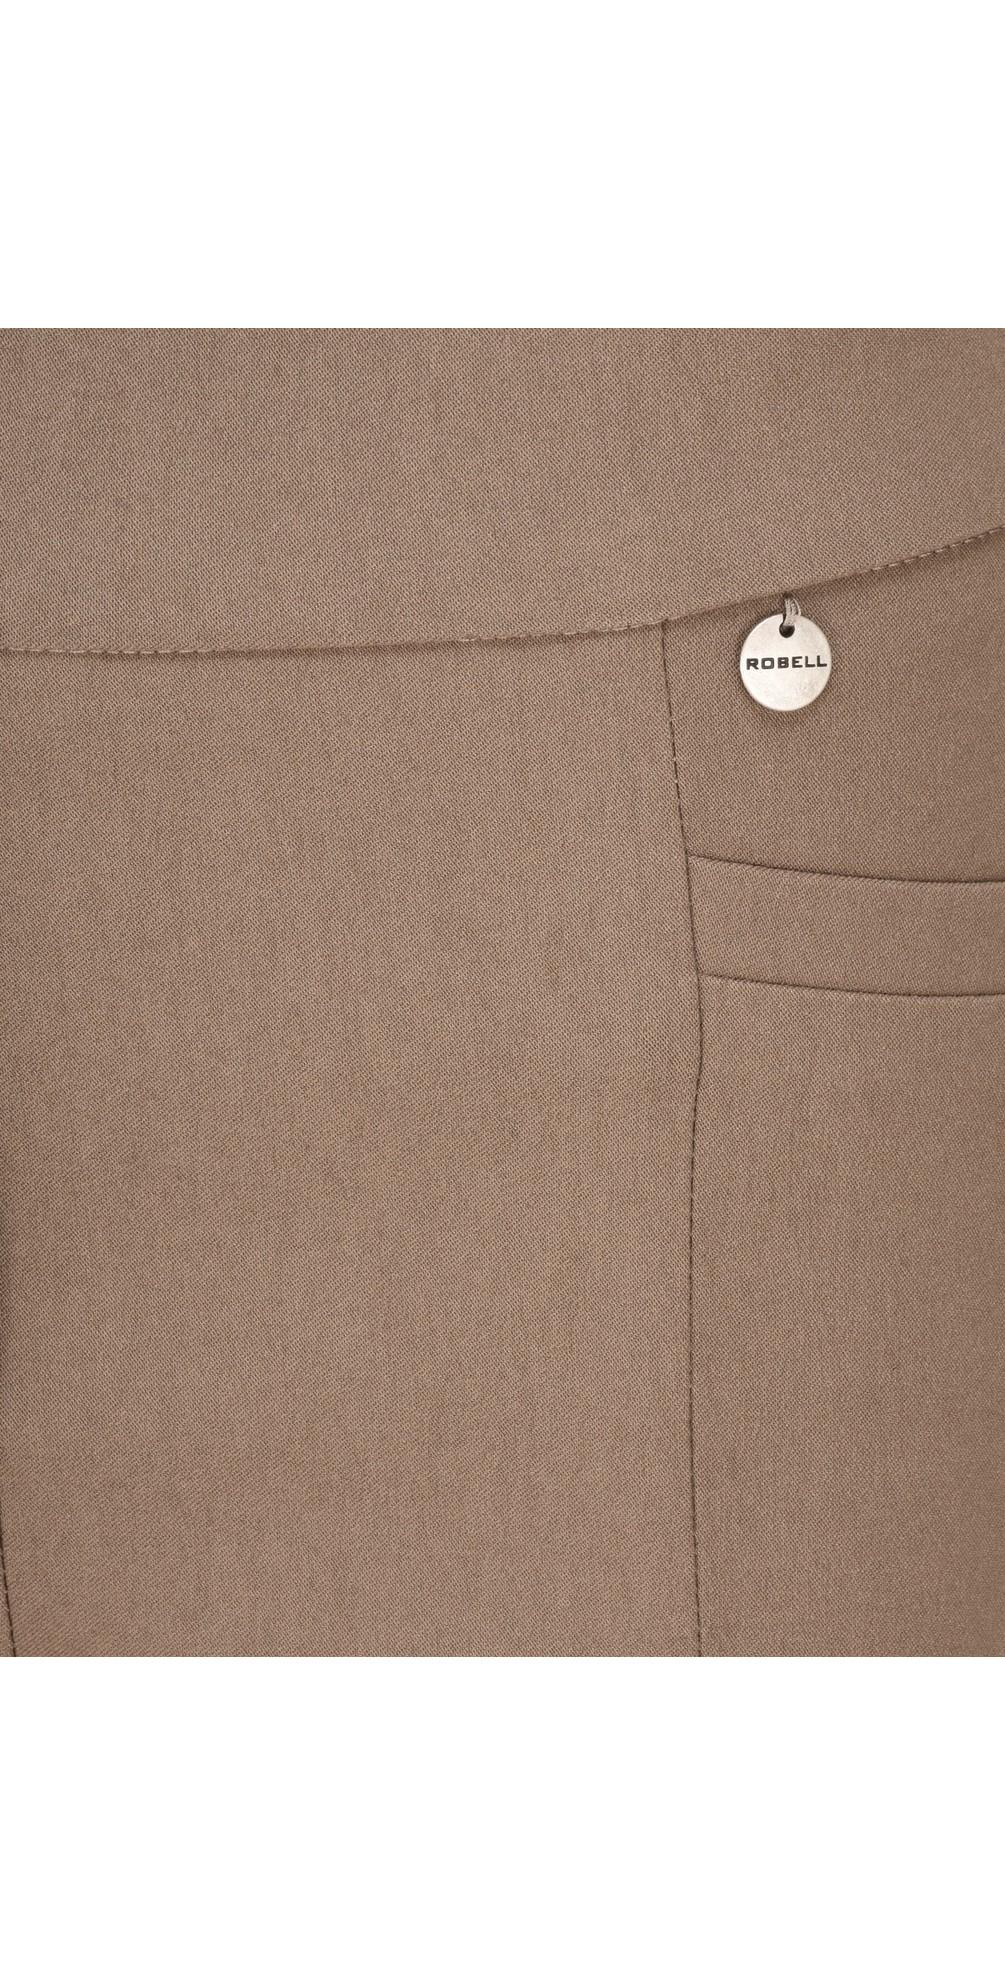 Nena 09 Almond Slimfit Fleece Lined Ankle Length Trouser main image